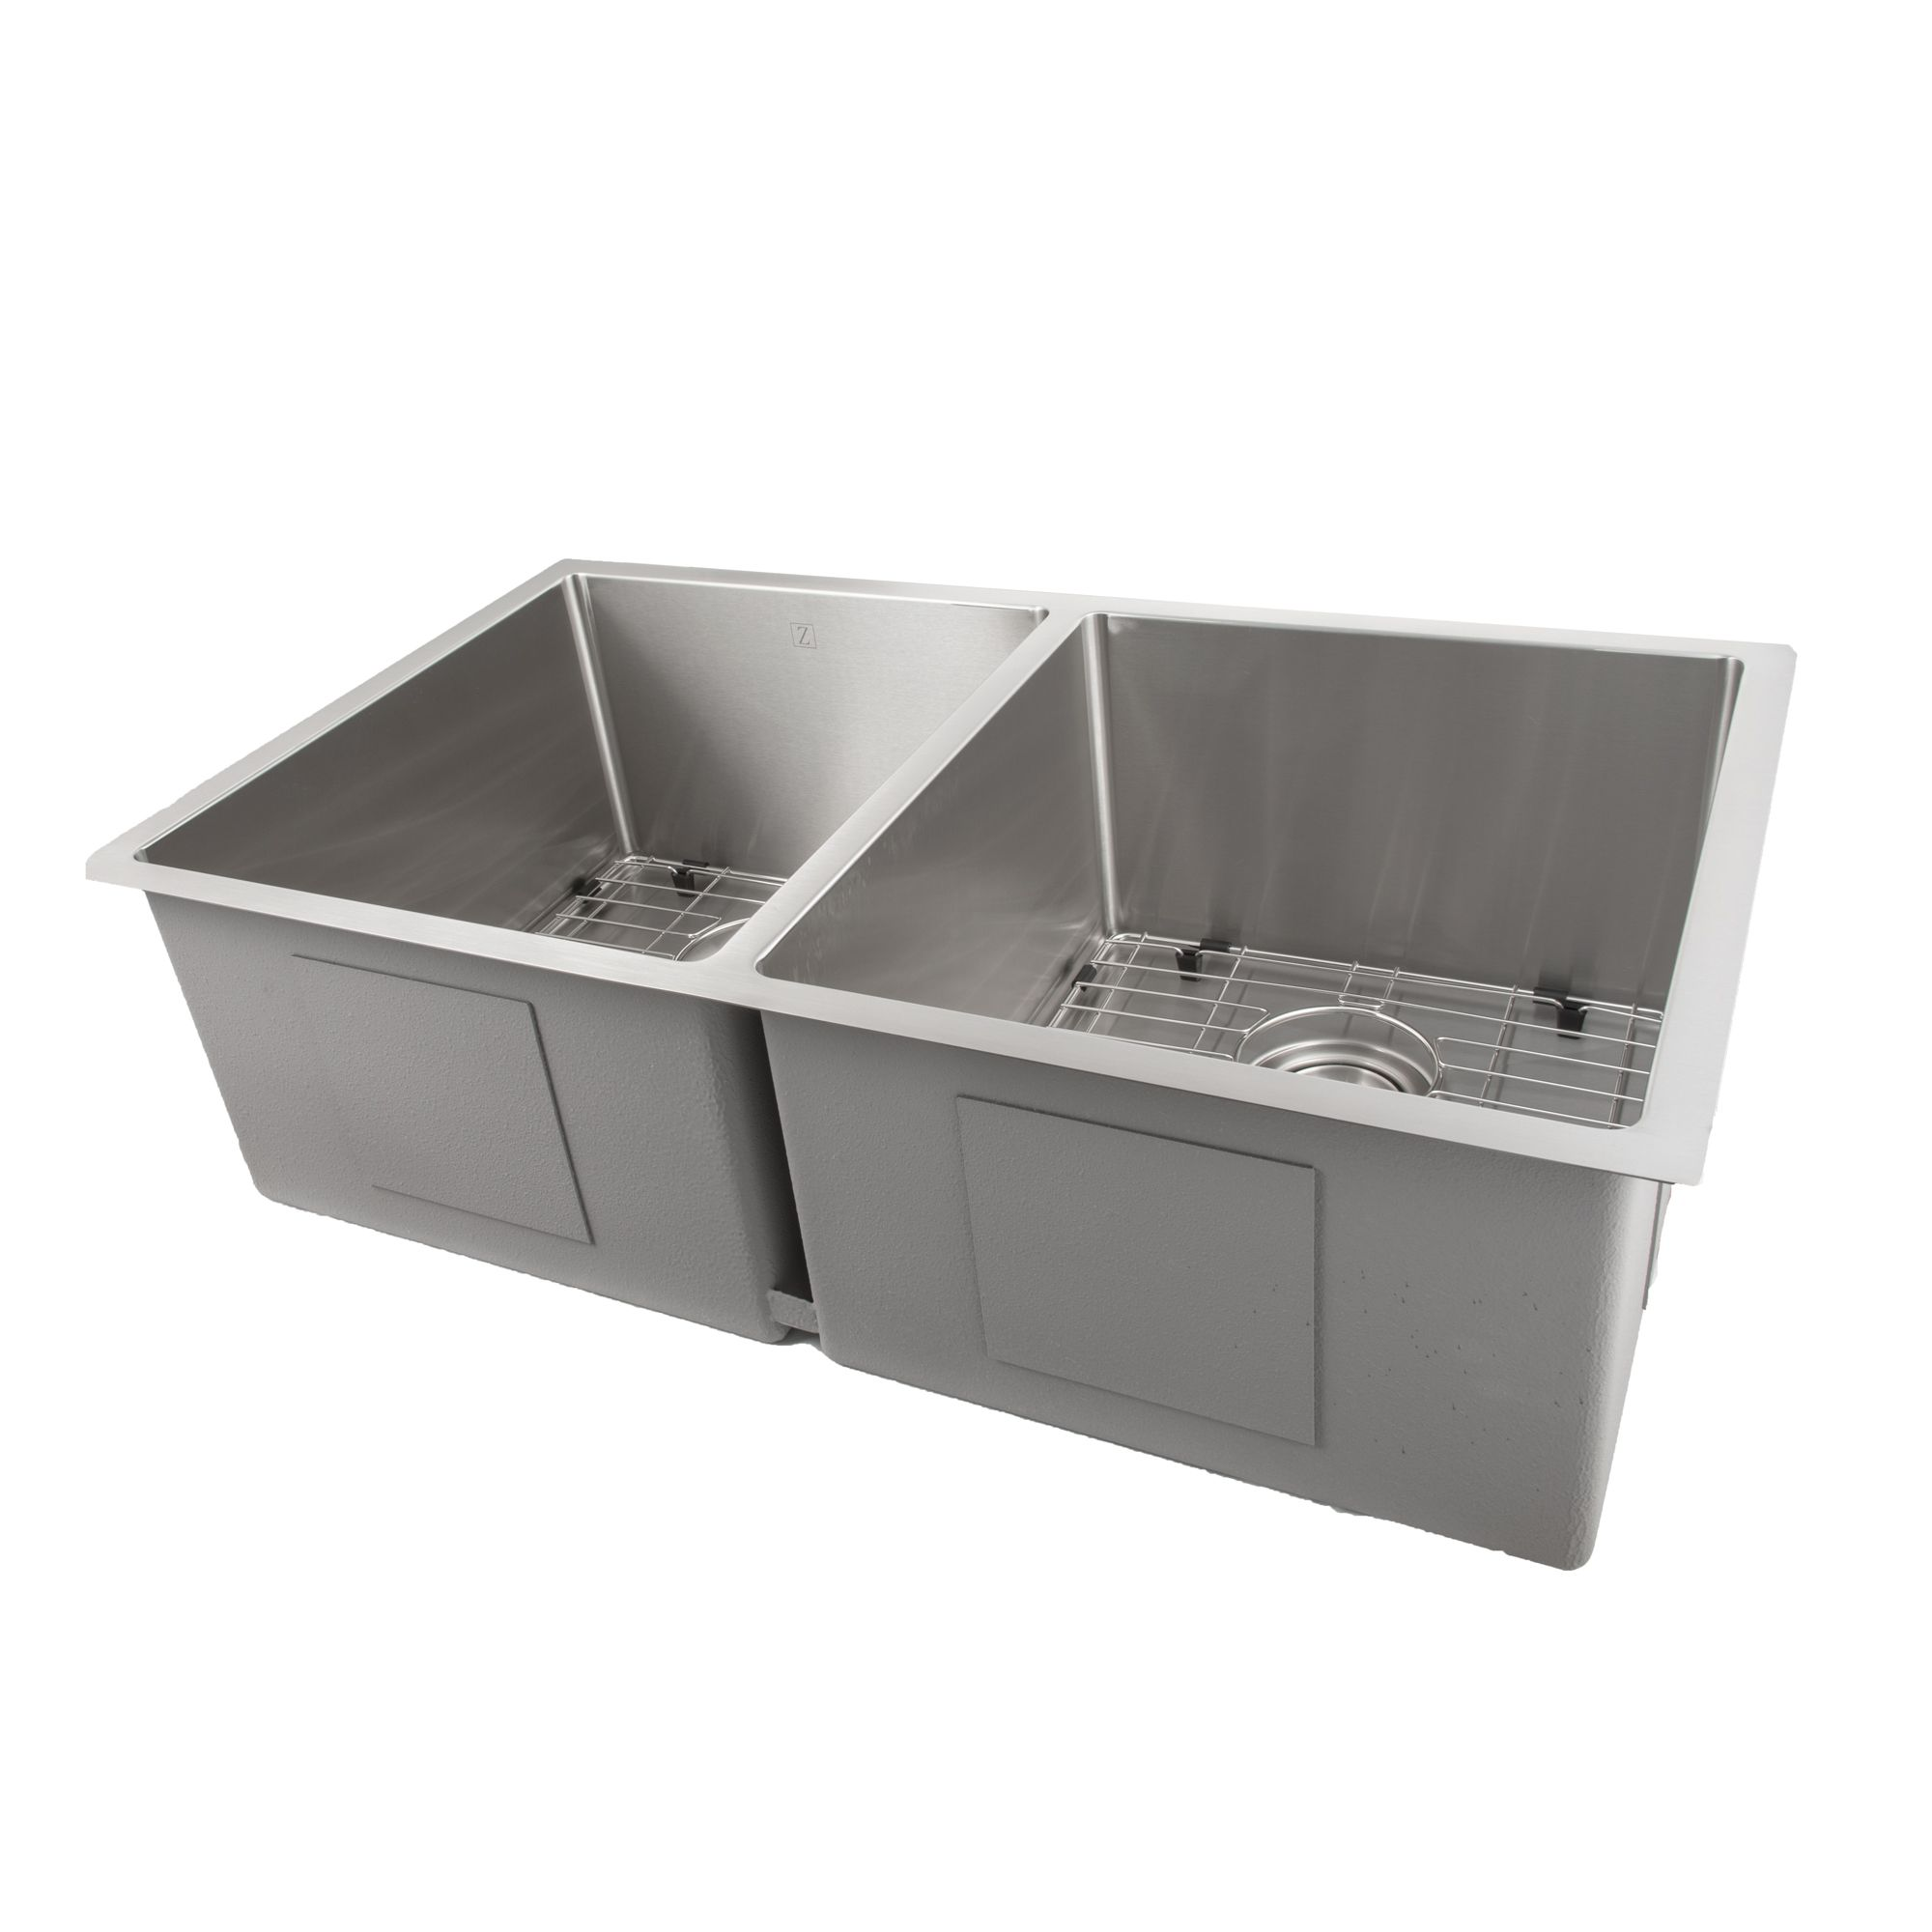 Zline Executive Series 33 Inch Undermount Double Bowl Sink In Stainless Steel Sr50d 33 Kitchen Sink Design Double Bowl Sink Kitchen Bath